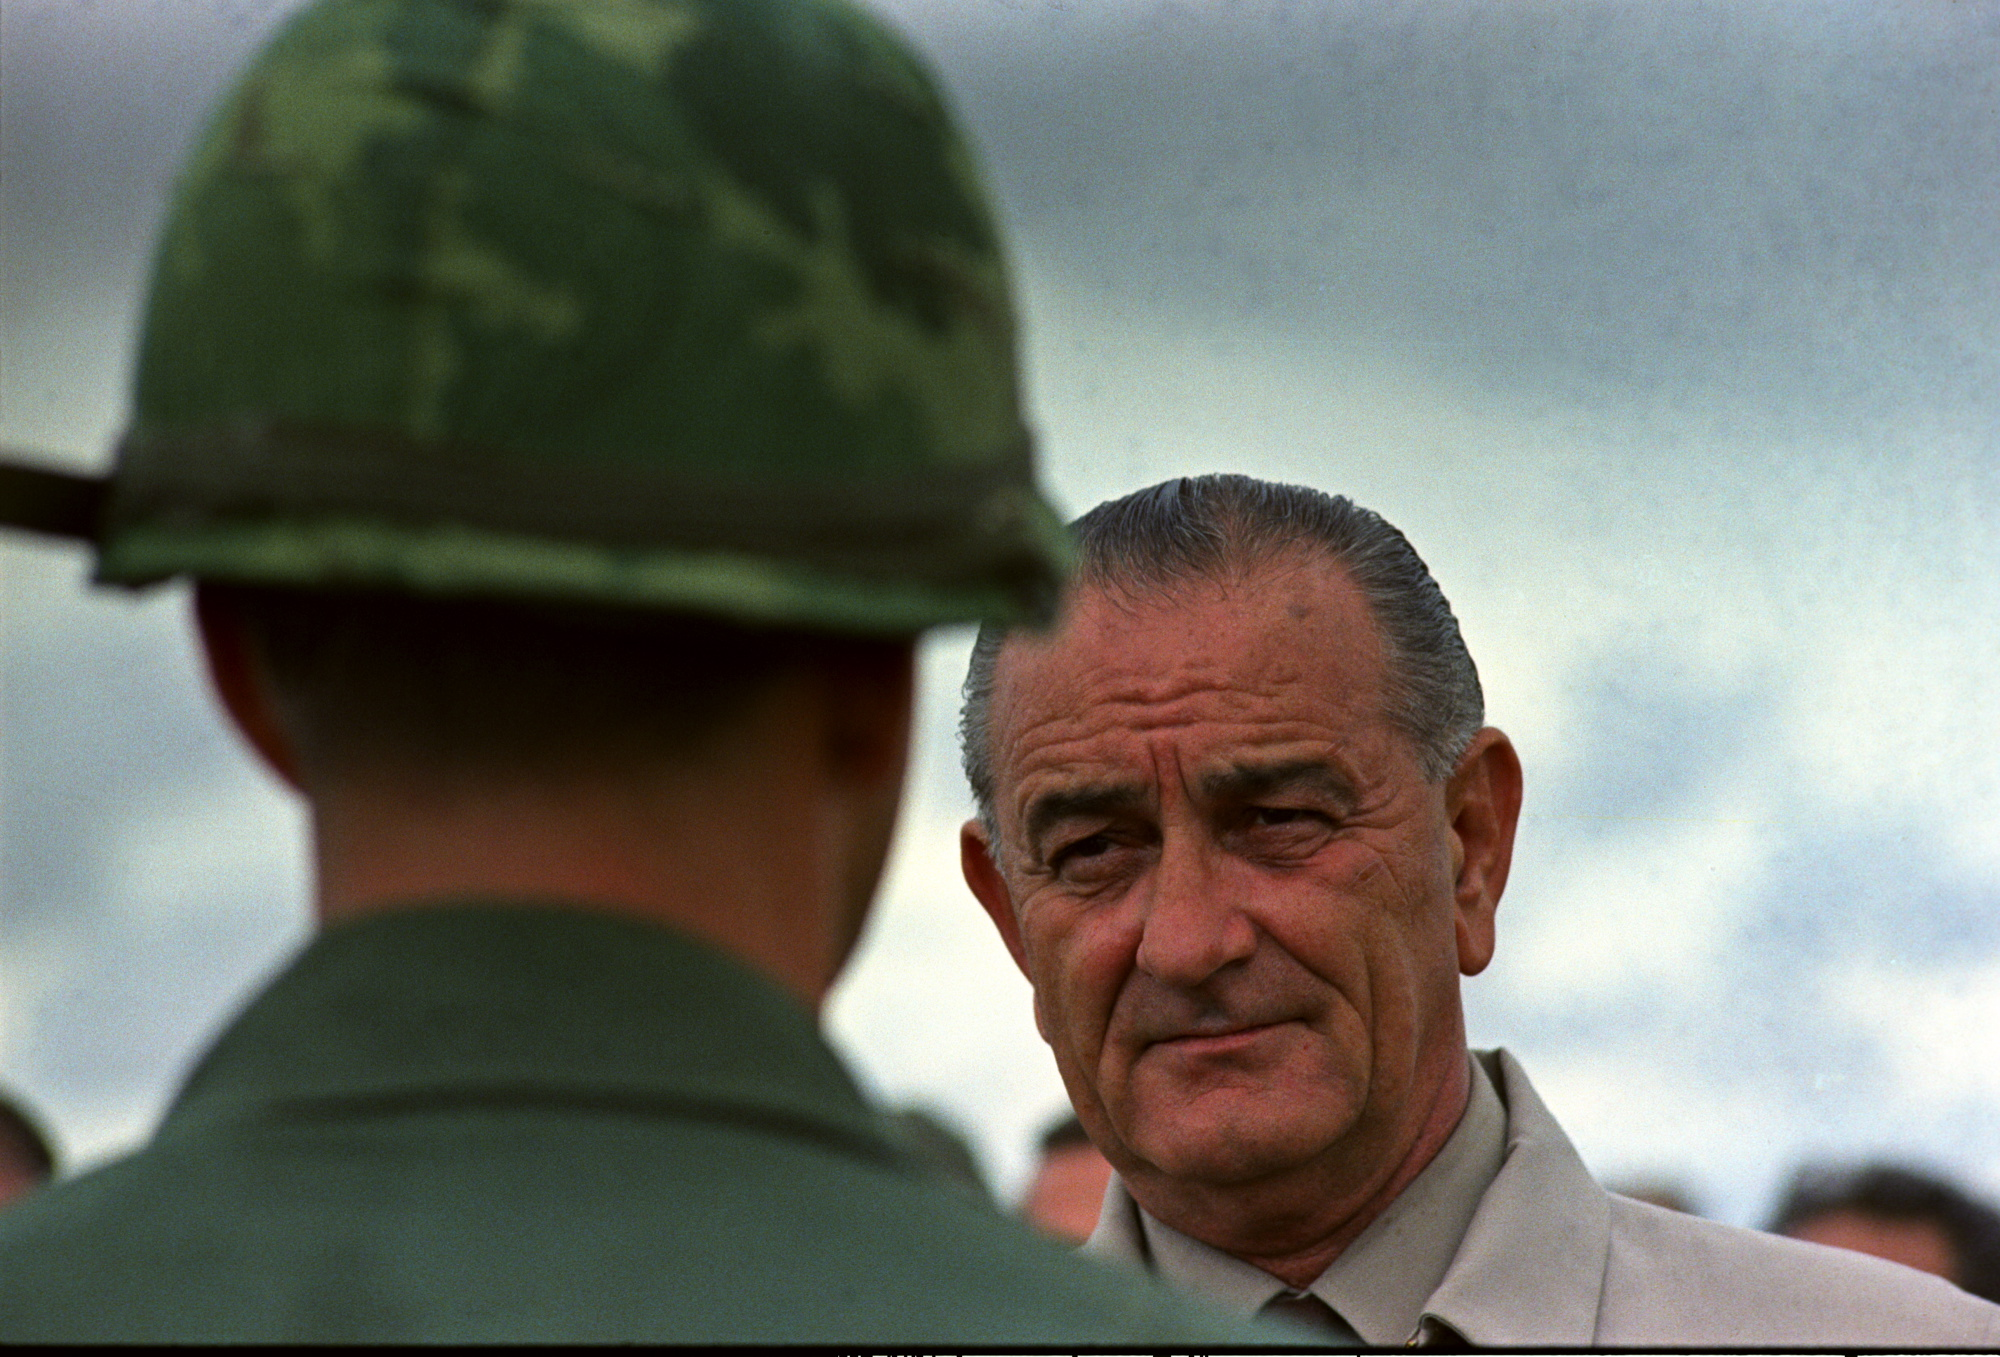 President Lyndon B. Johnson's visit to Vietnam